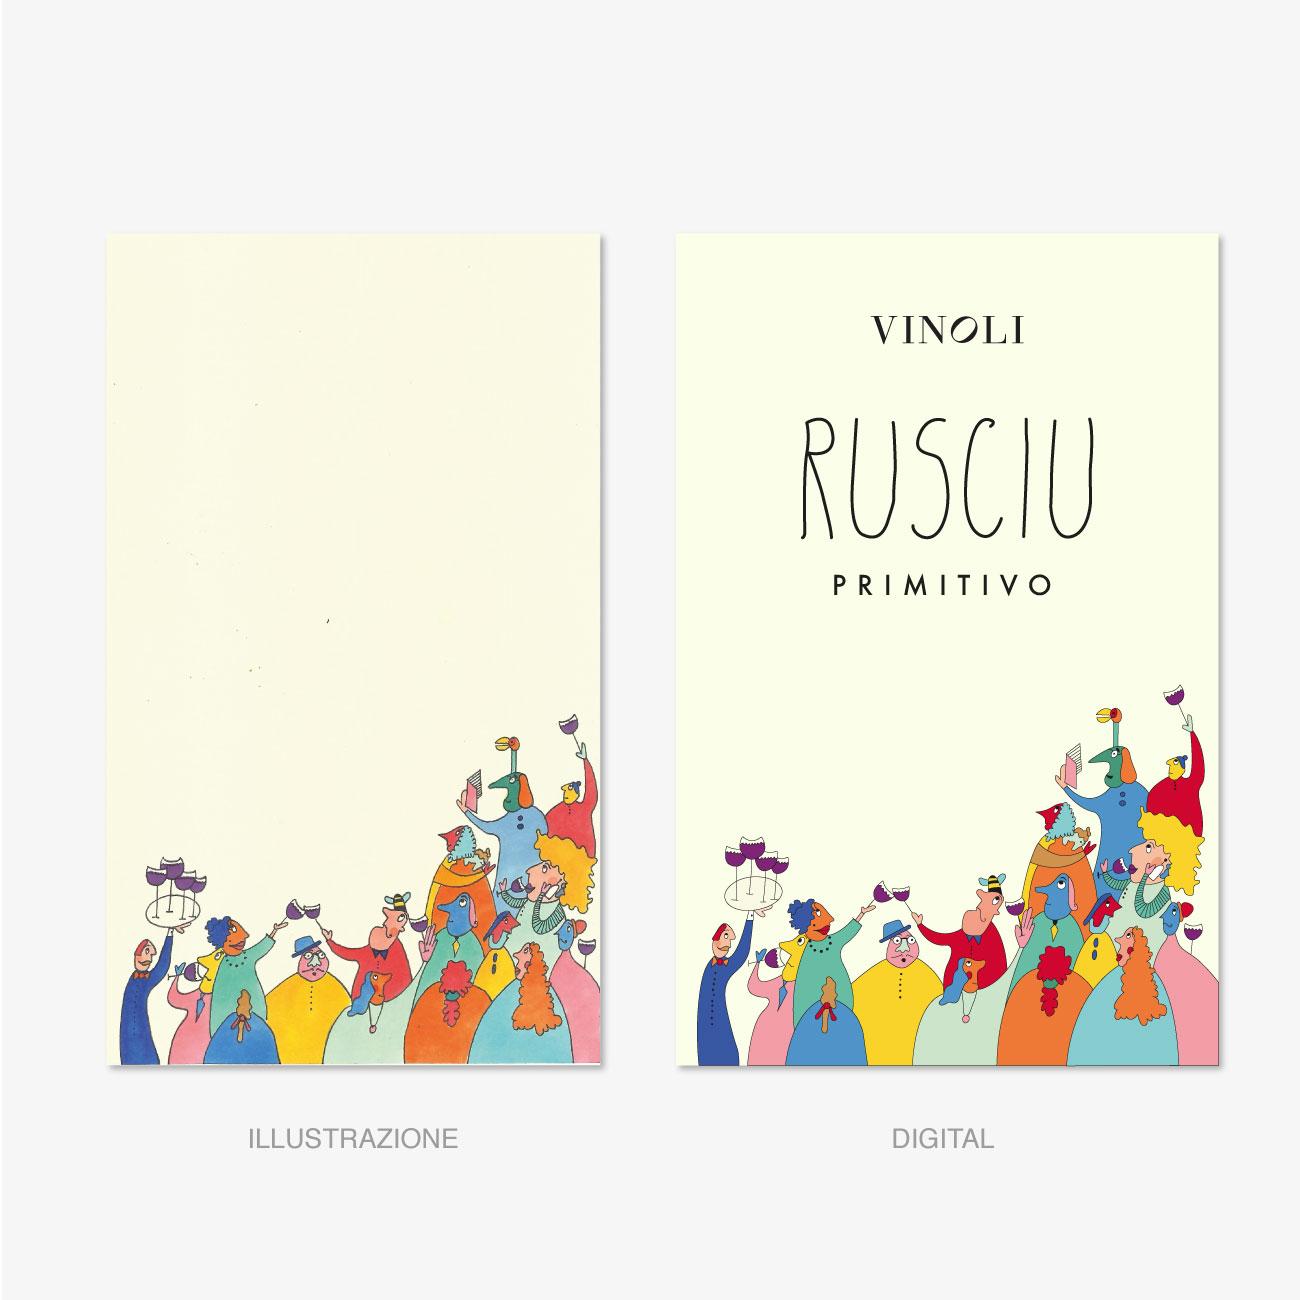 https://www.orlandinifrancesco.com/wp/wp-content/uploads/2019/07/Digital-Label-Rusciu-Cantina-Vinoli.jpg